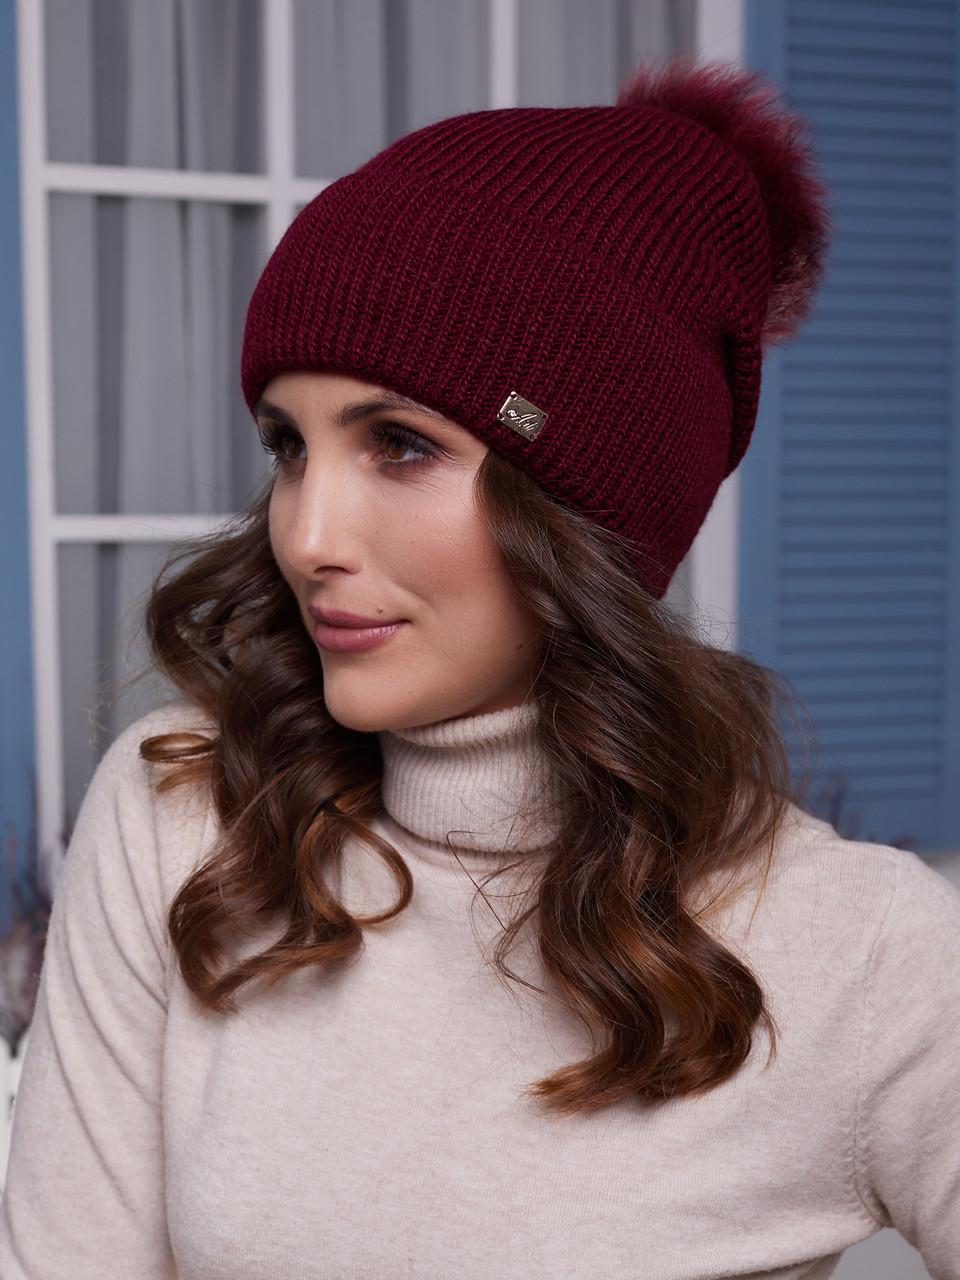 Жіноча шапка Іріда з помпоном натуральним песцовым